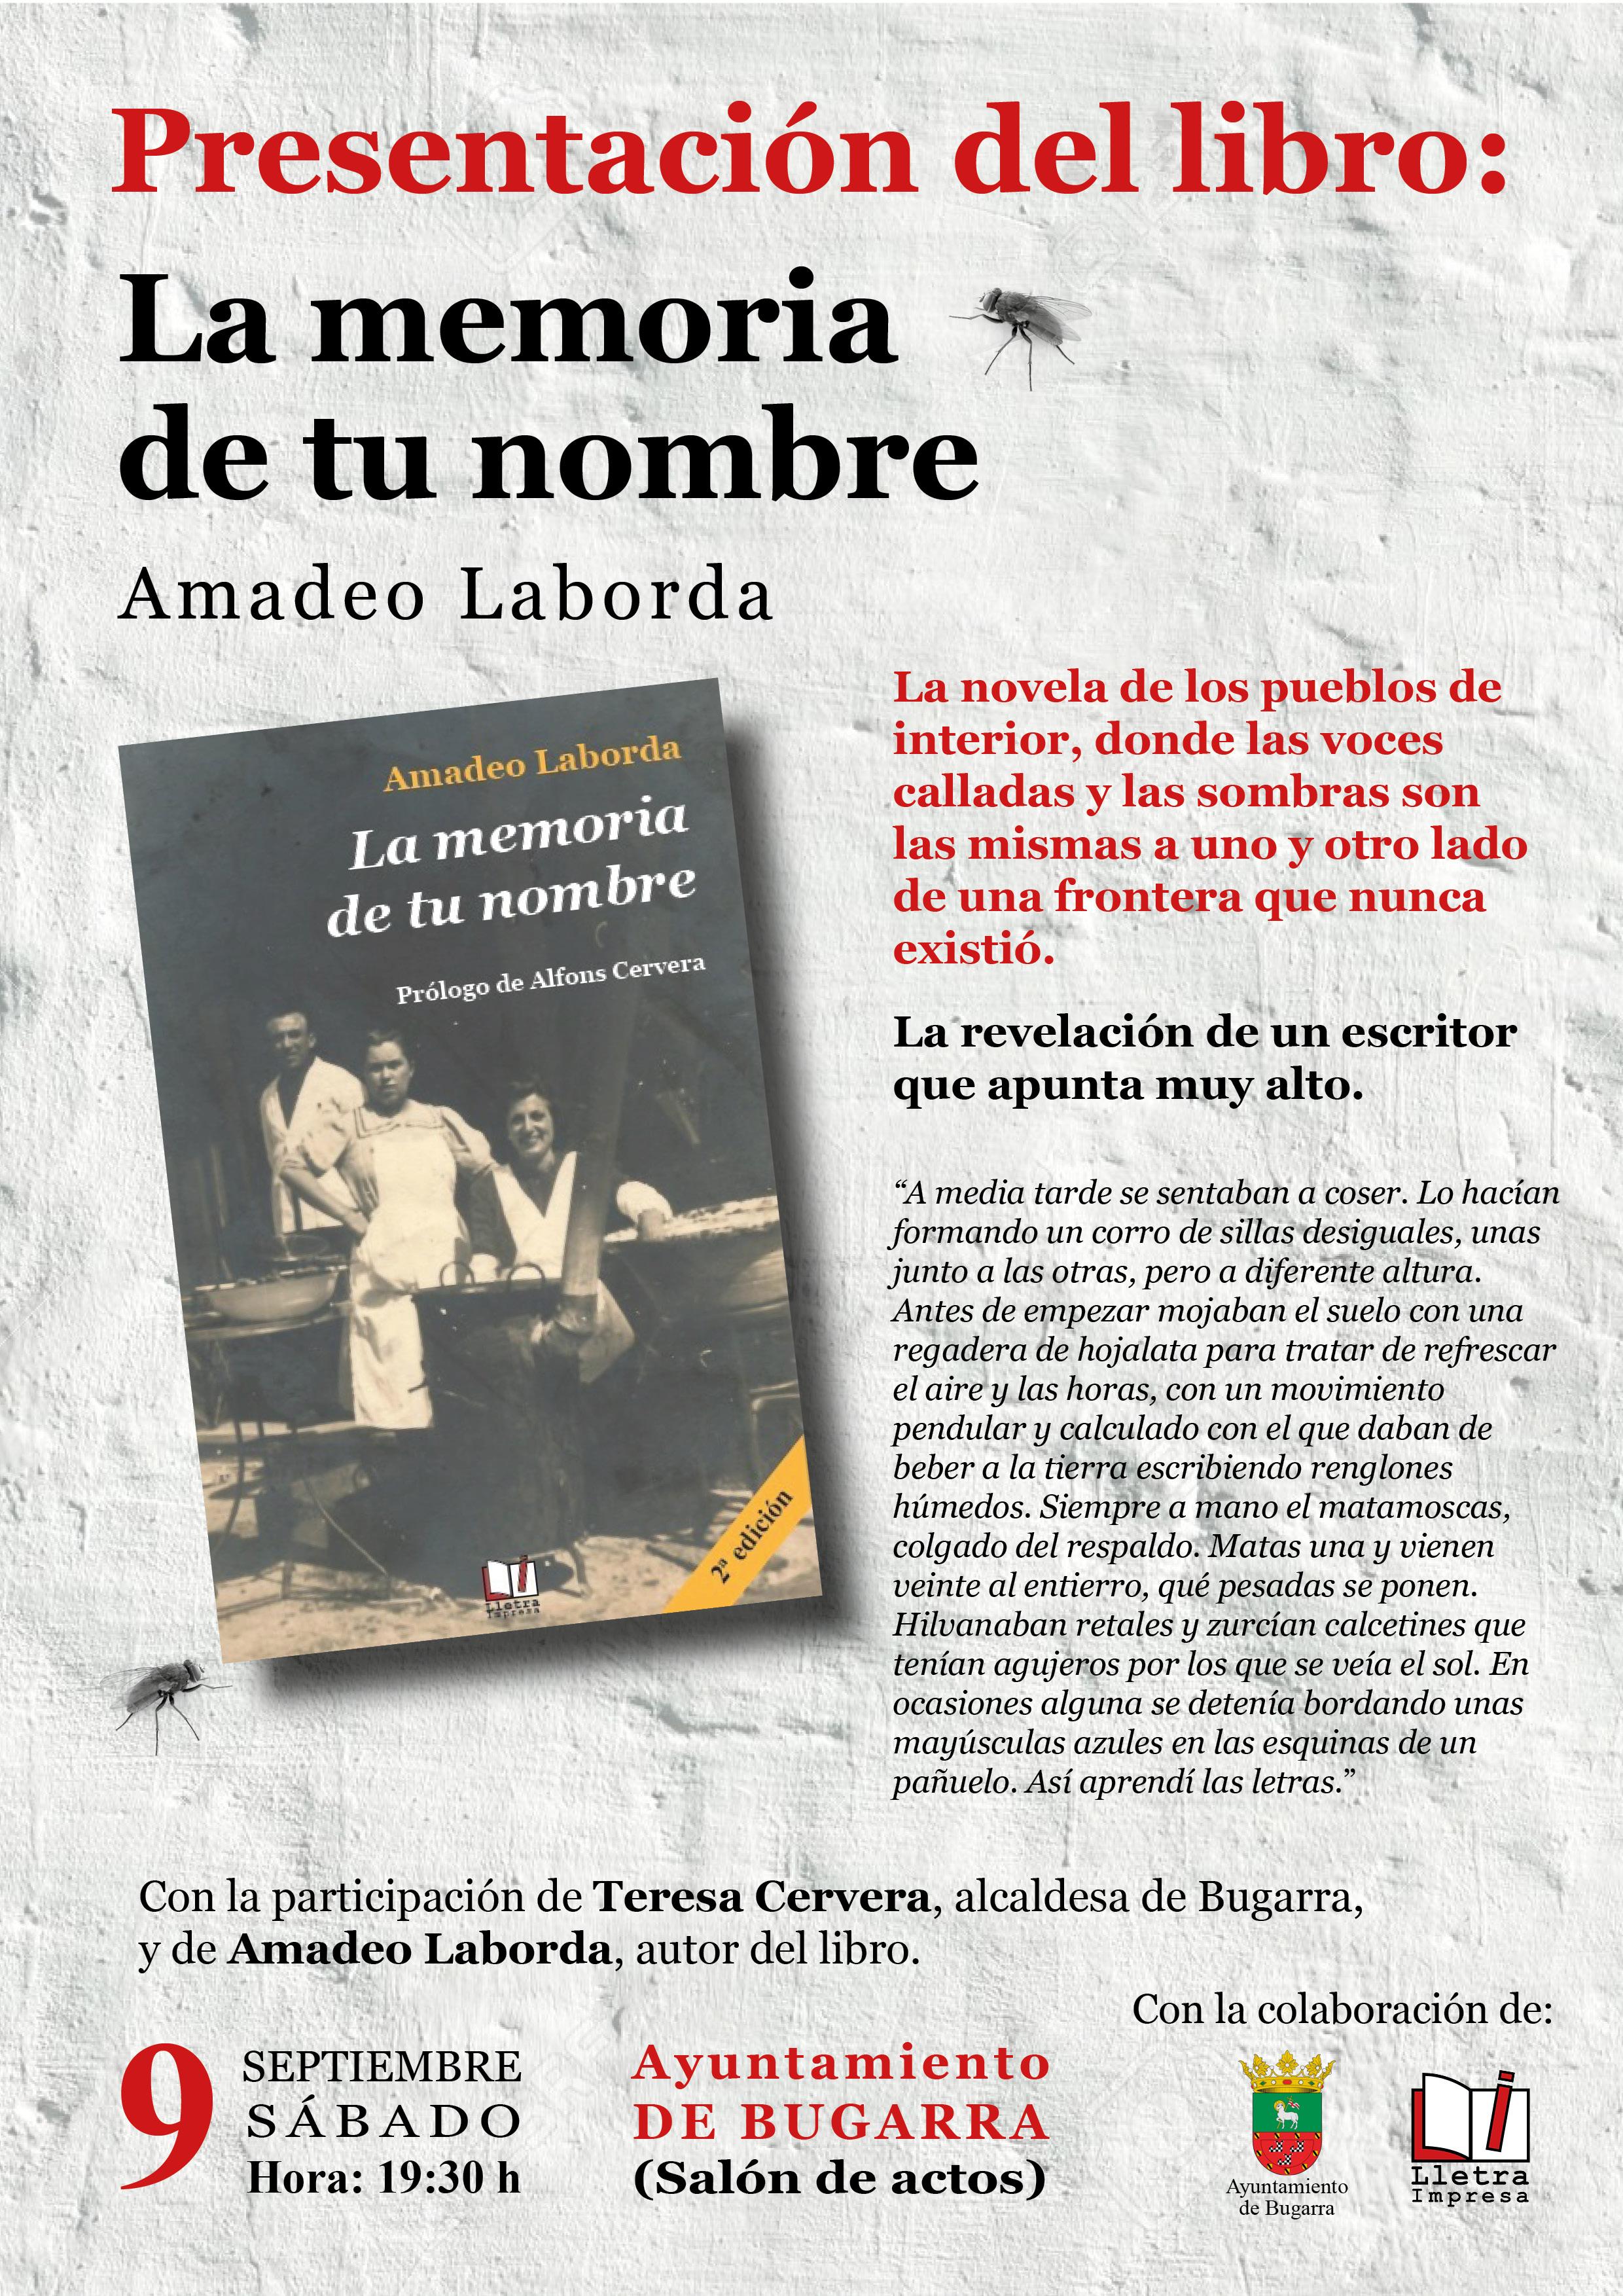 Cartel del acto cultural en Bugarra.